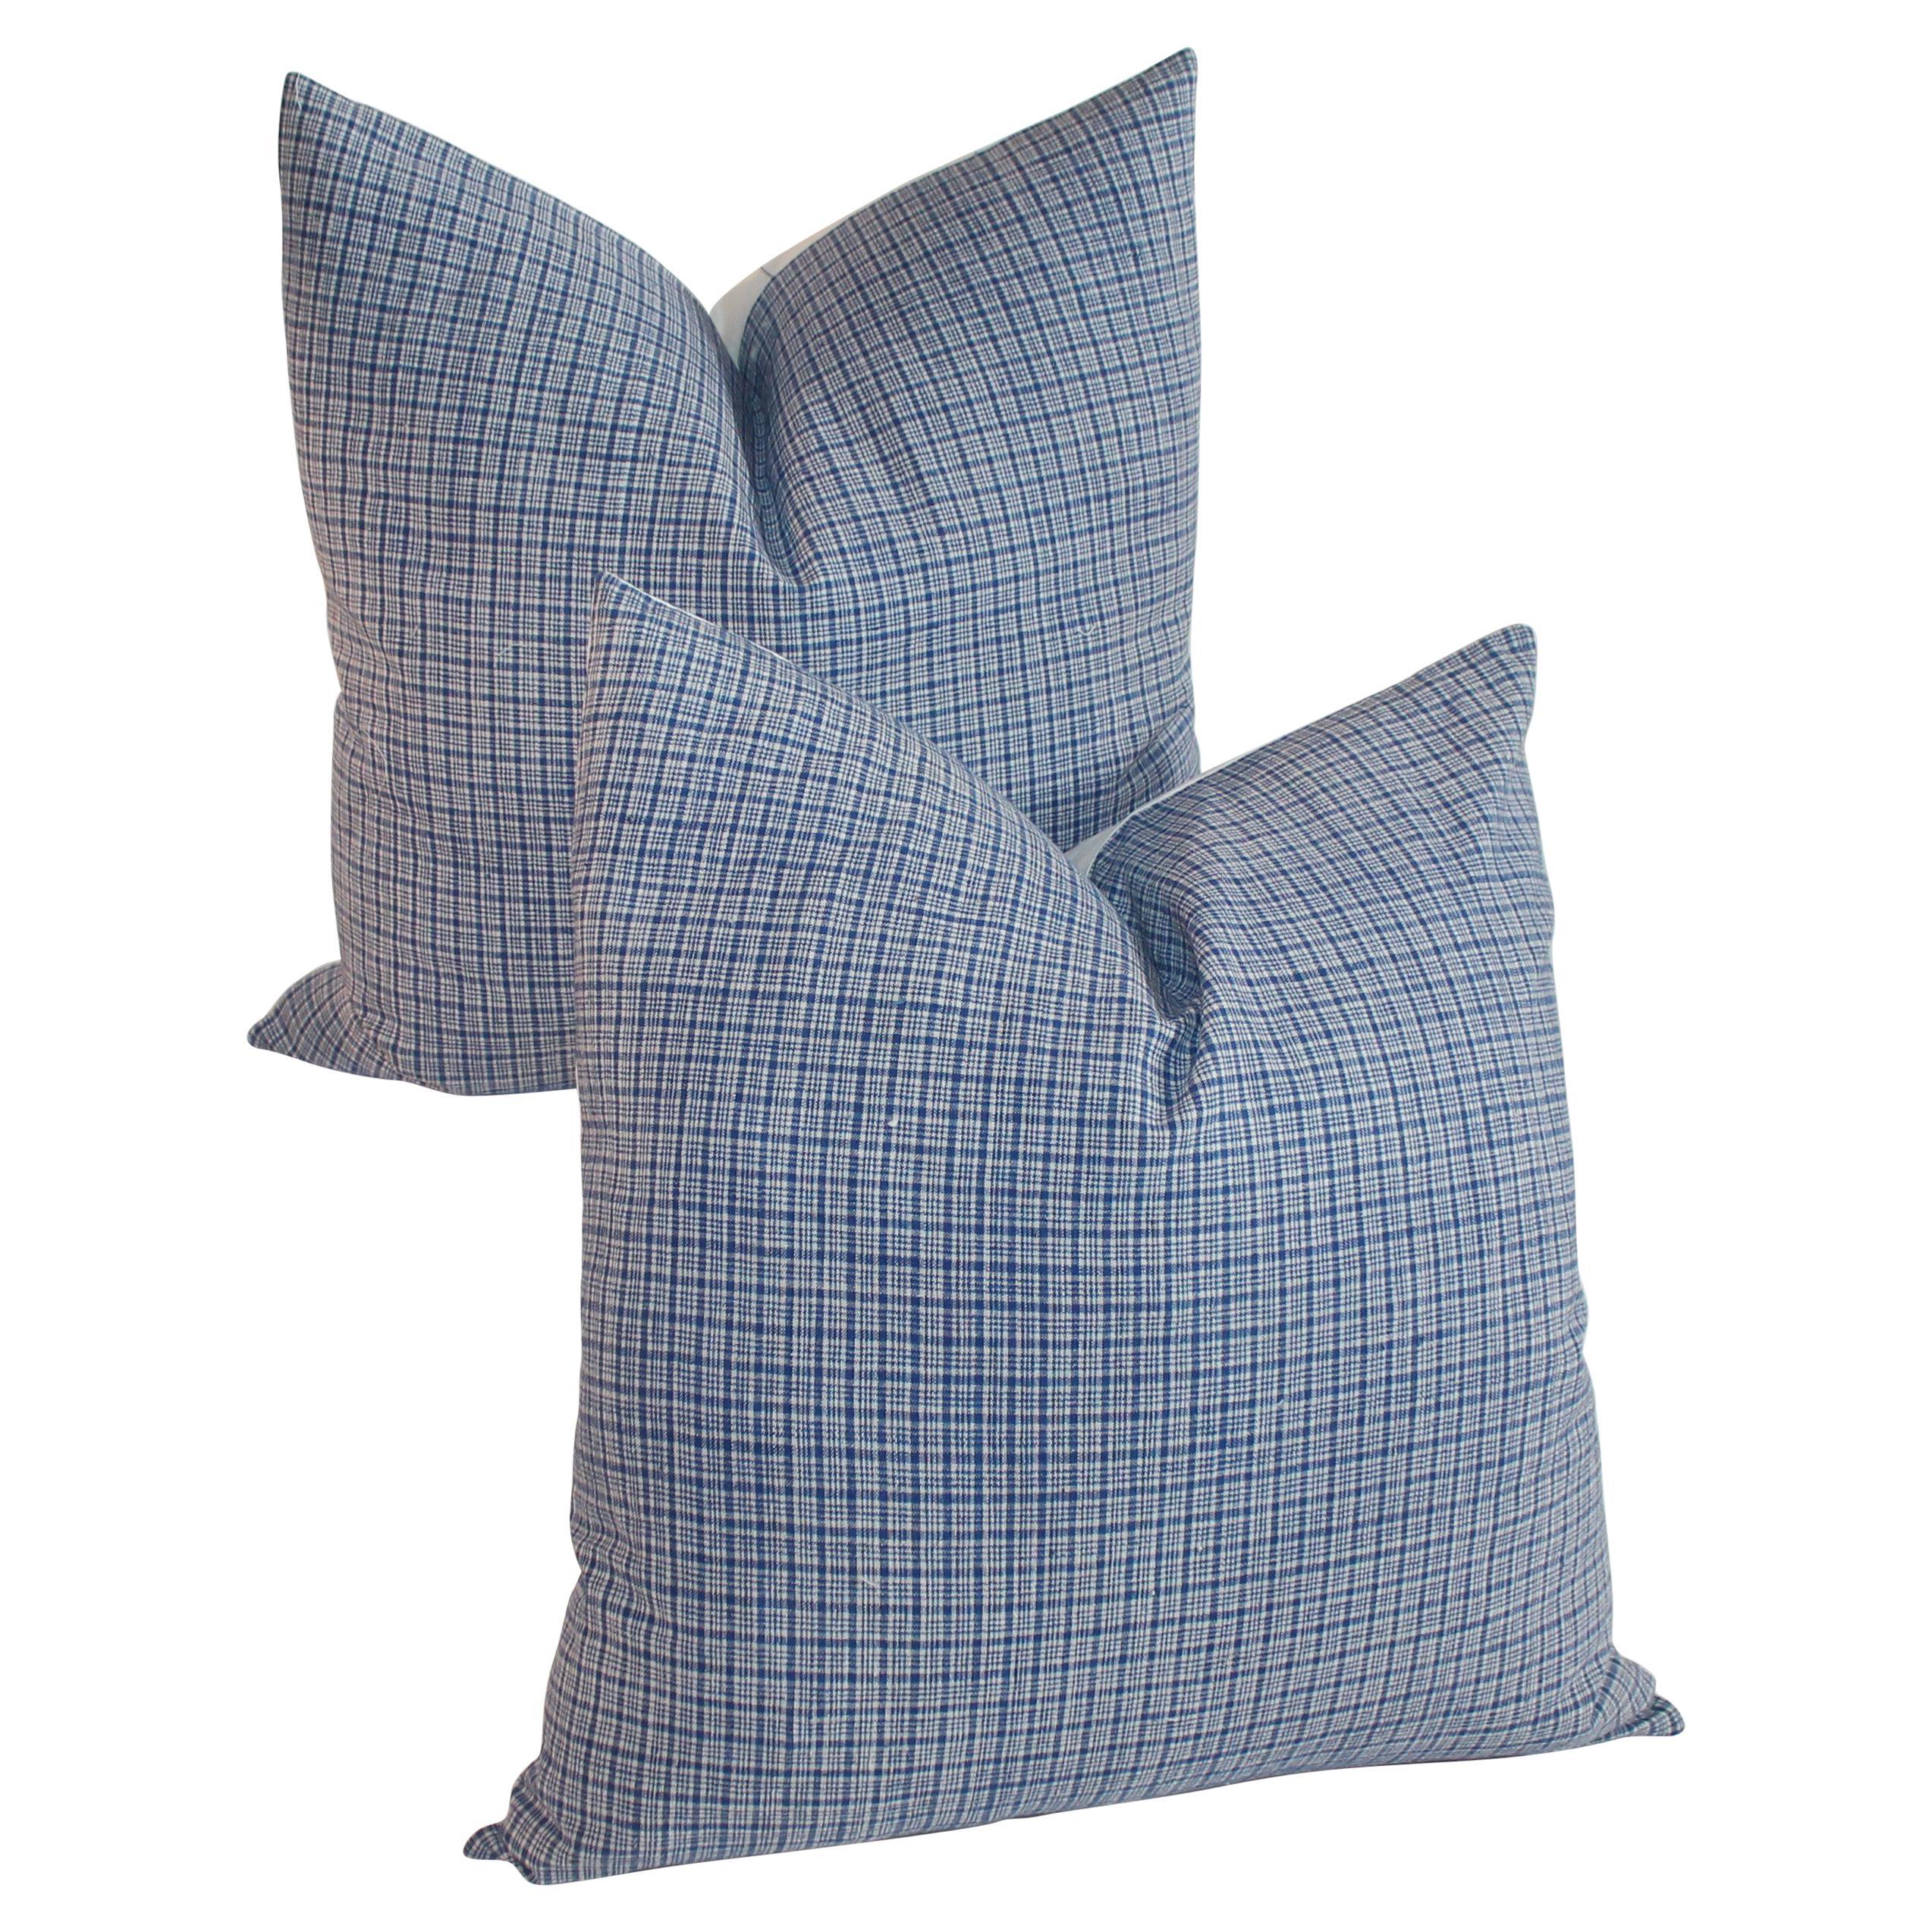 19th Century Homespun Linen  Pillows, Pair